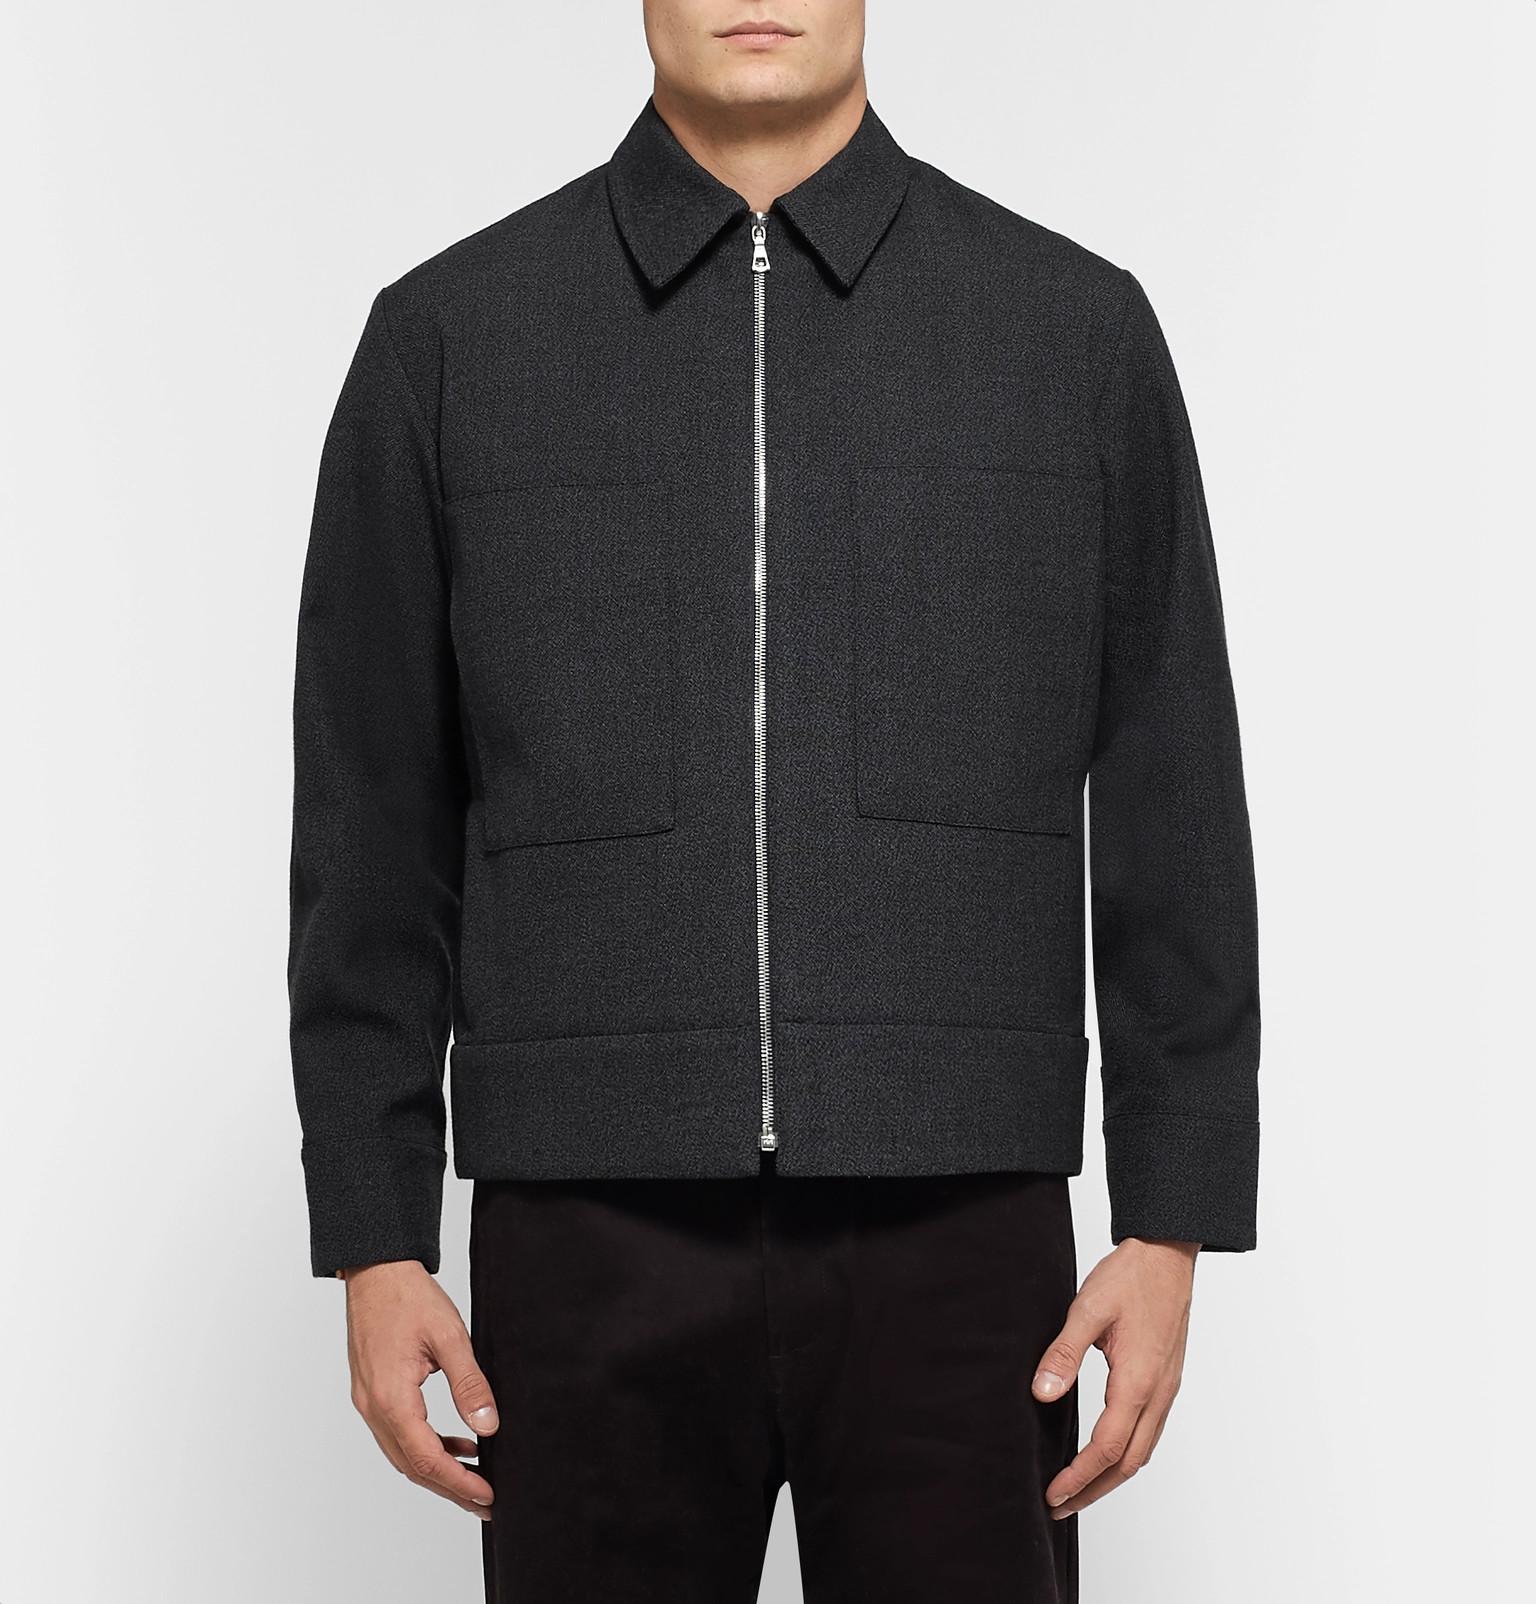 Blouson Wool Nicholsonmarquis Jacket Thornproof Studio qnAwUant